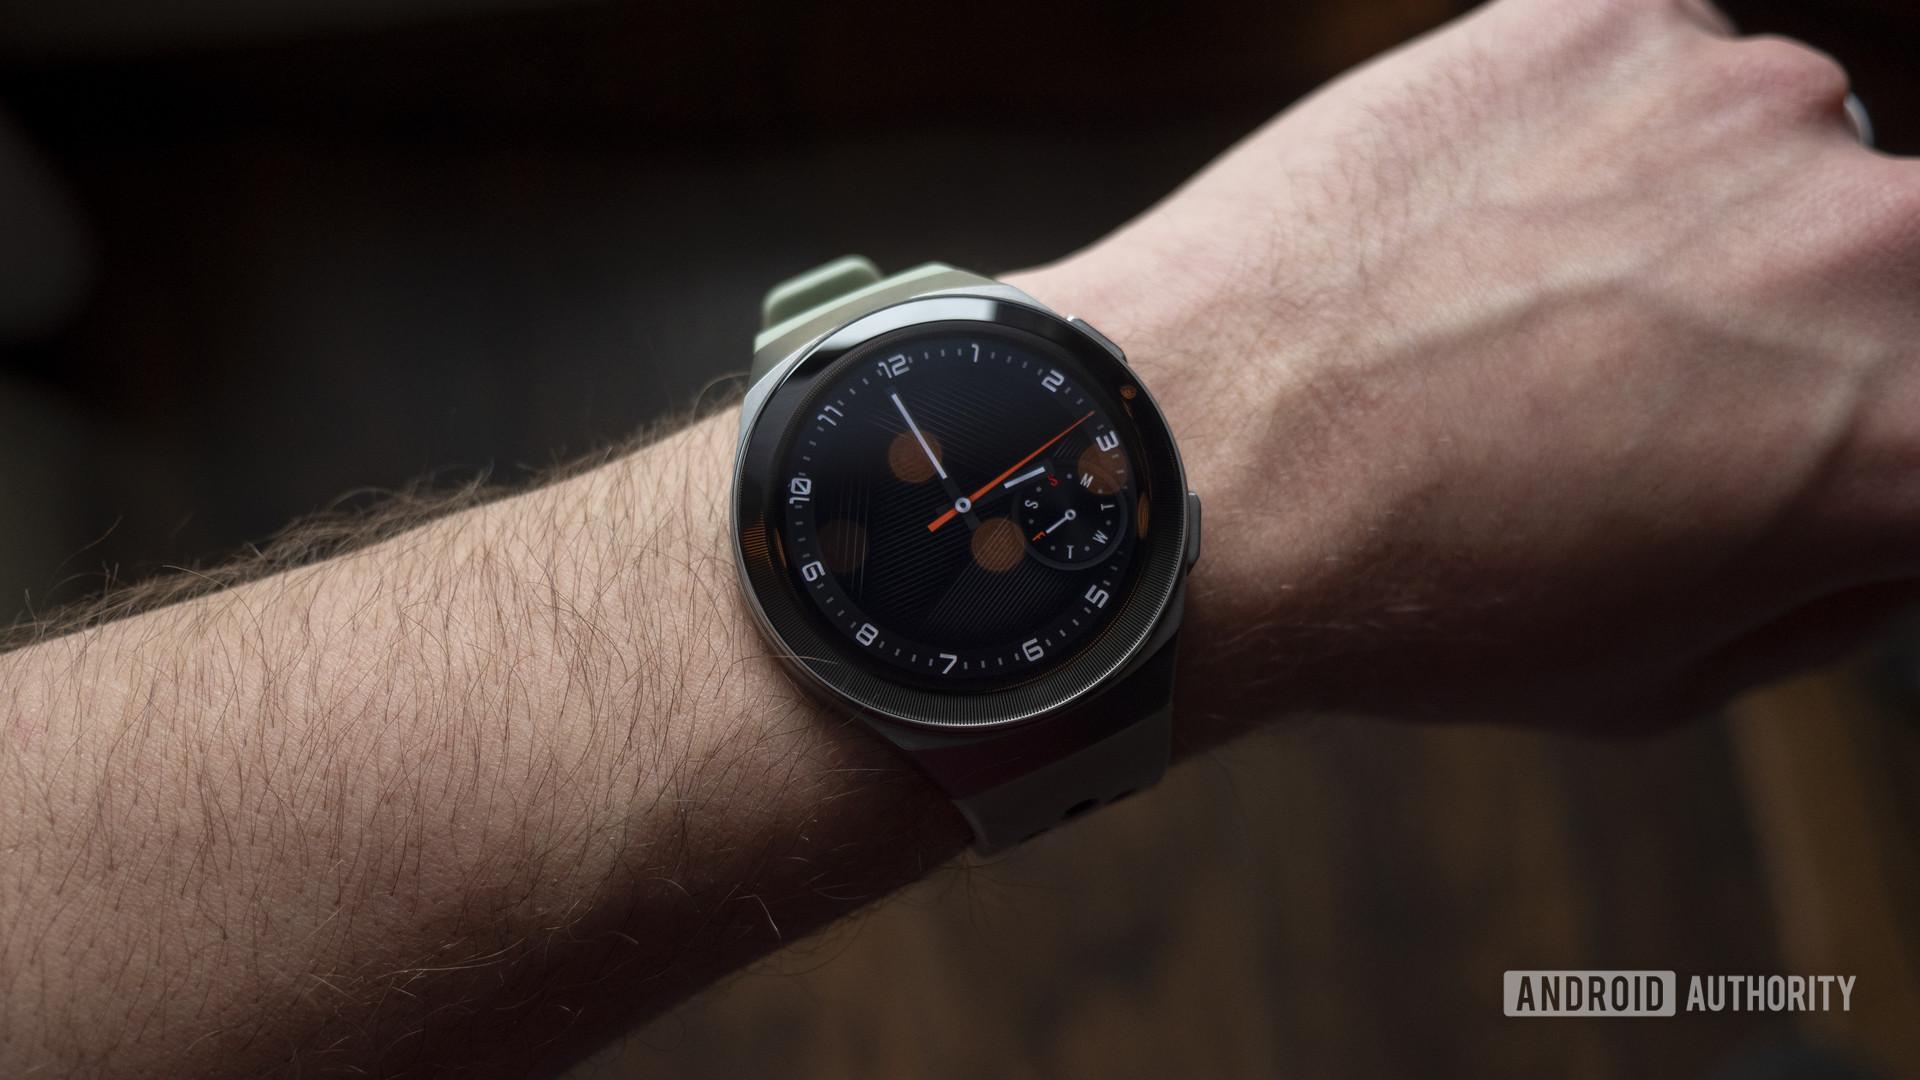 huawei watch gt 2e review on wrist analog watch face 2